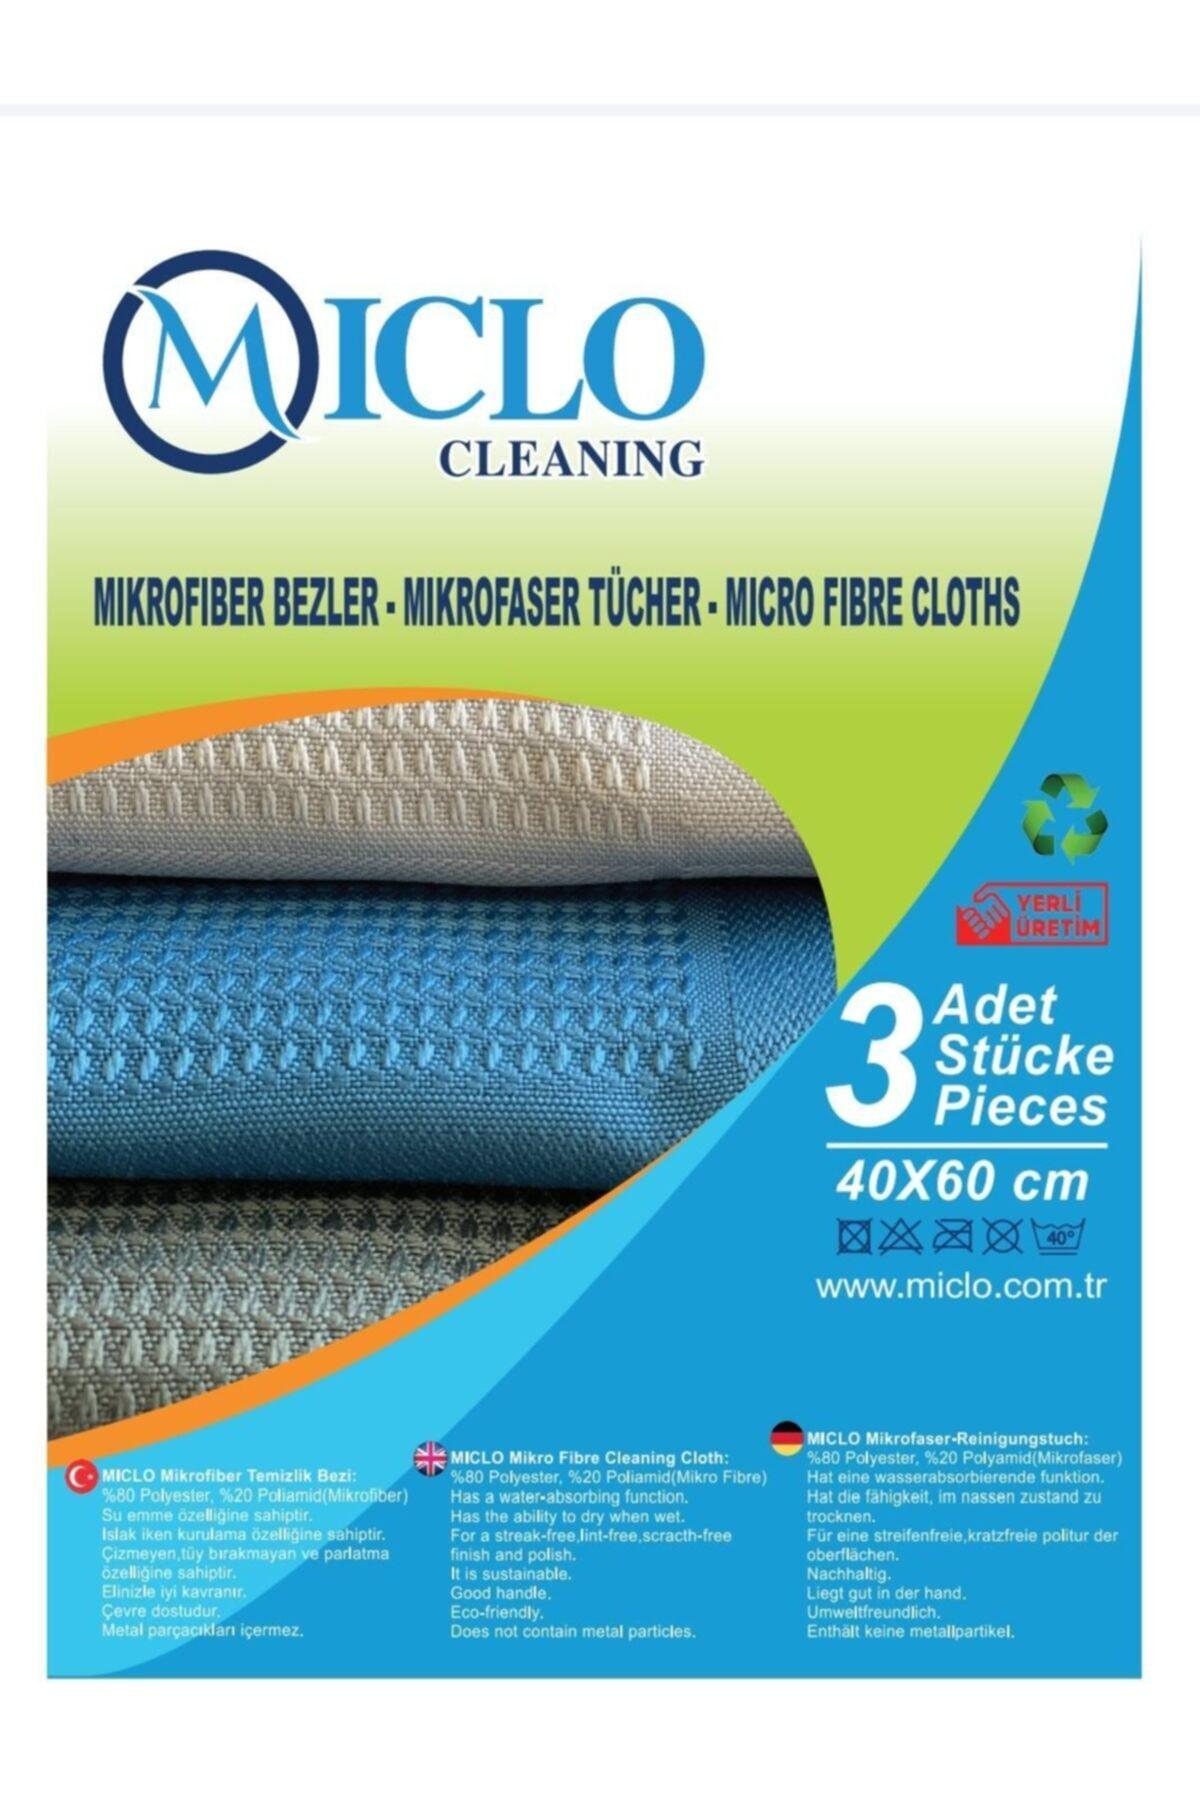 Miclo Cleaning Mikrofiber Bez (pella Tr) Akçakoyunlu/kayseri